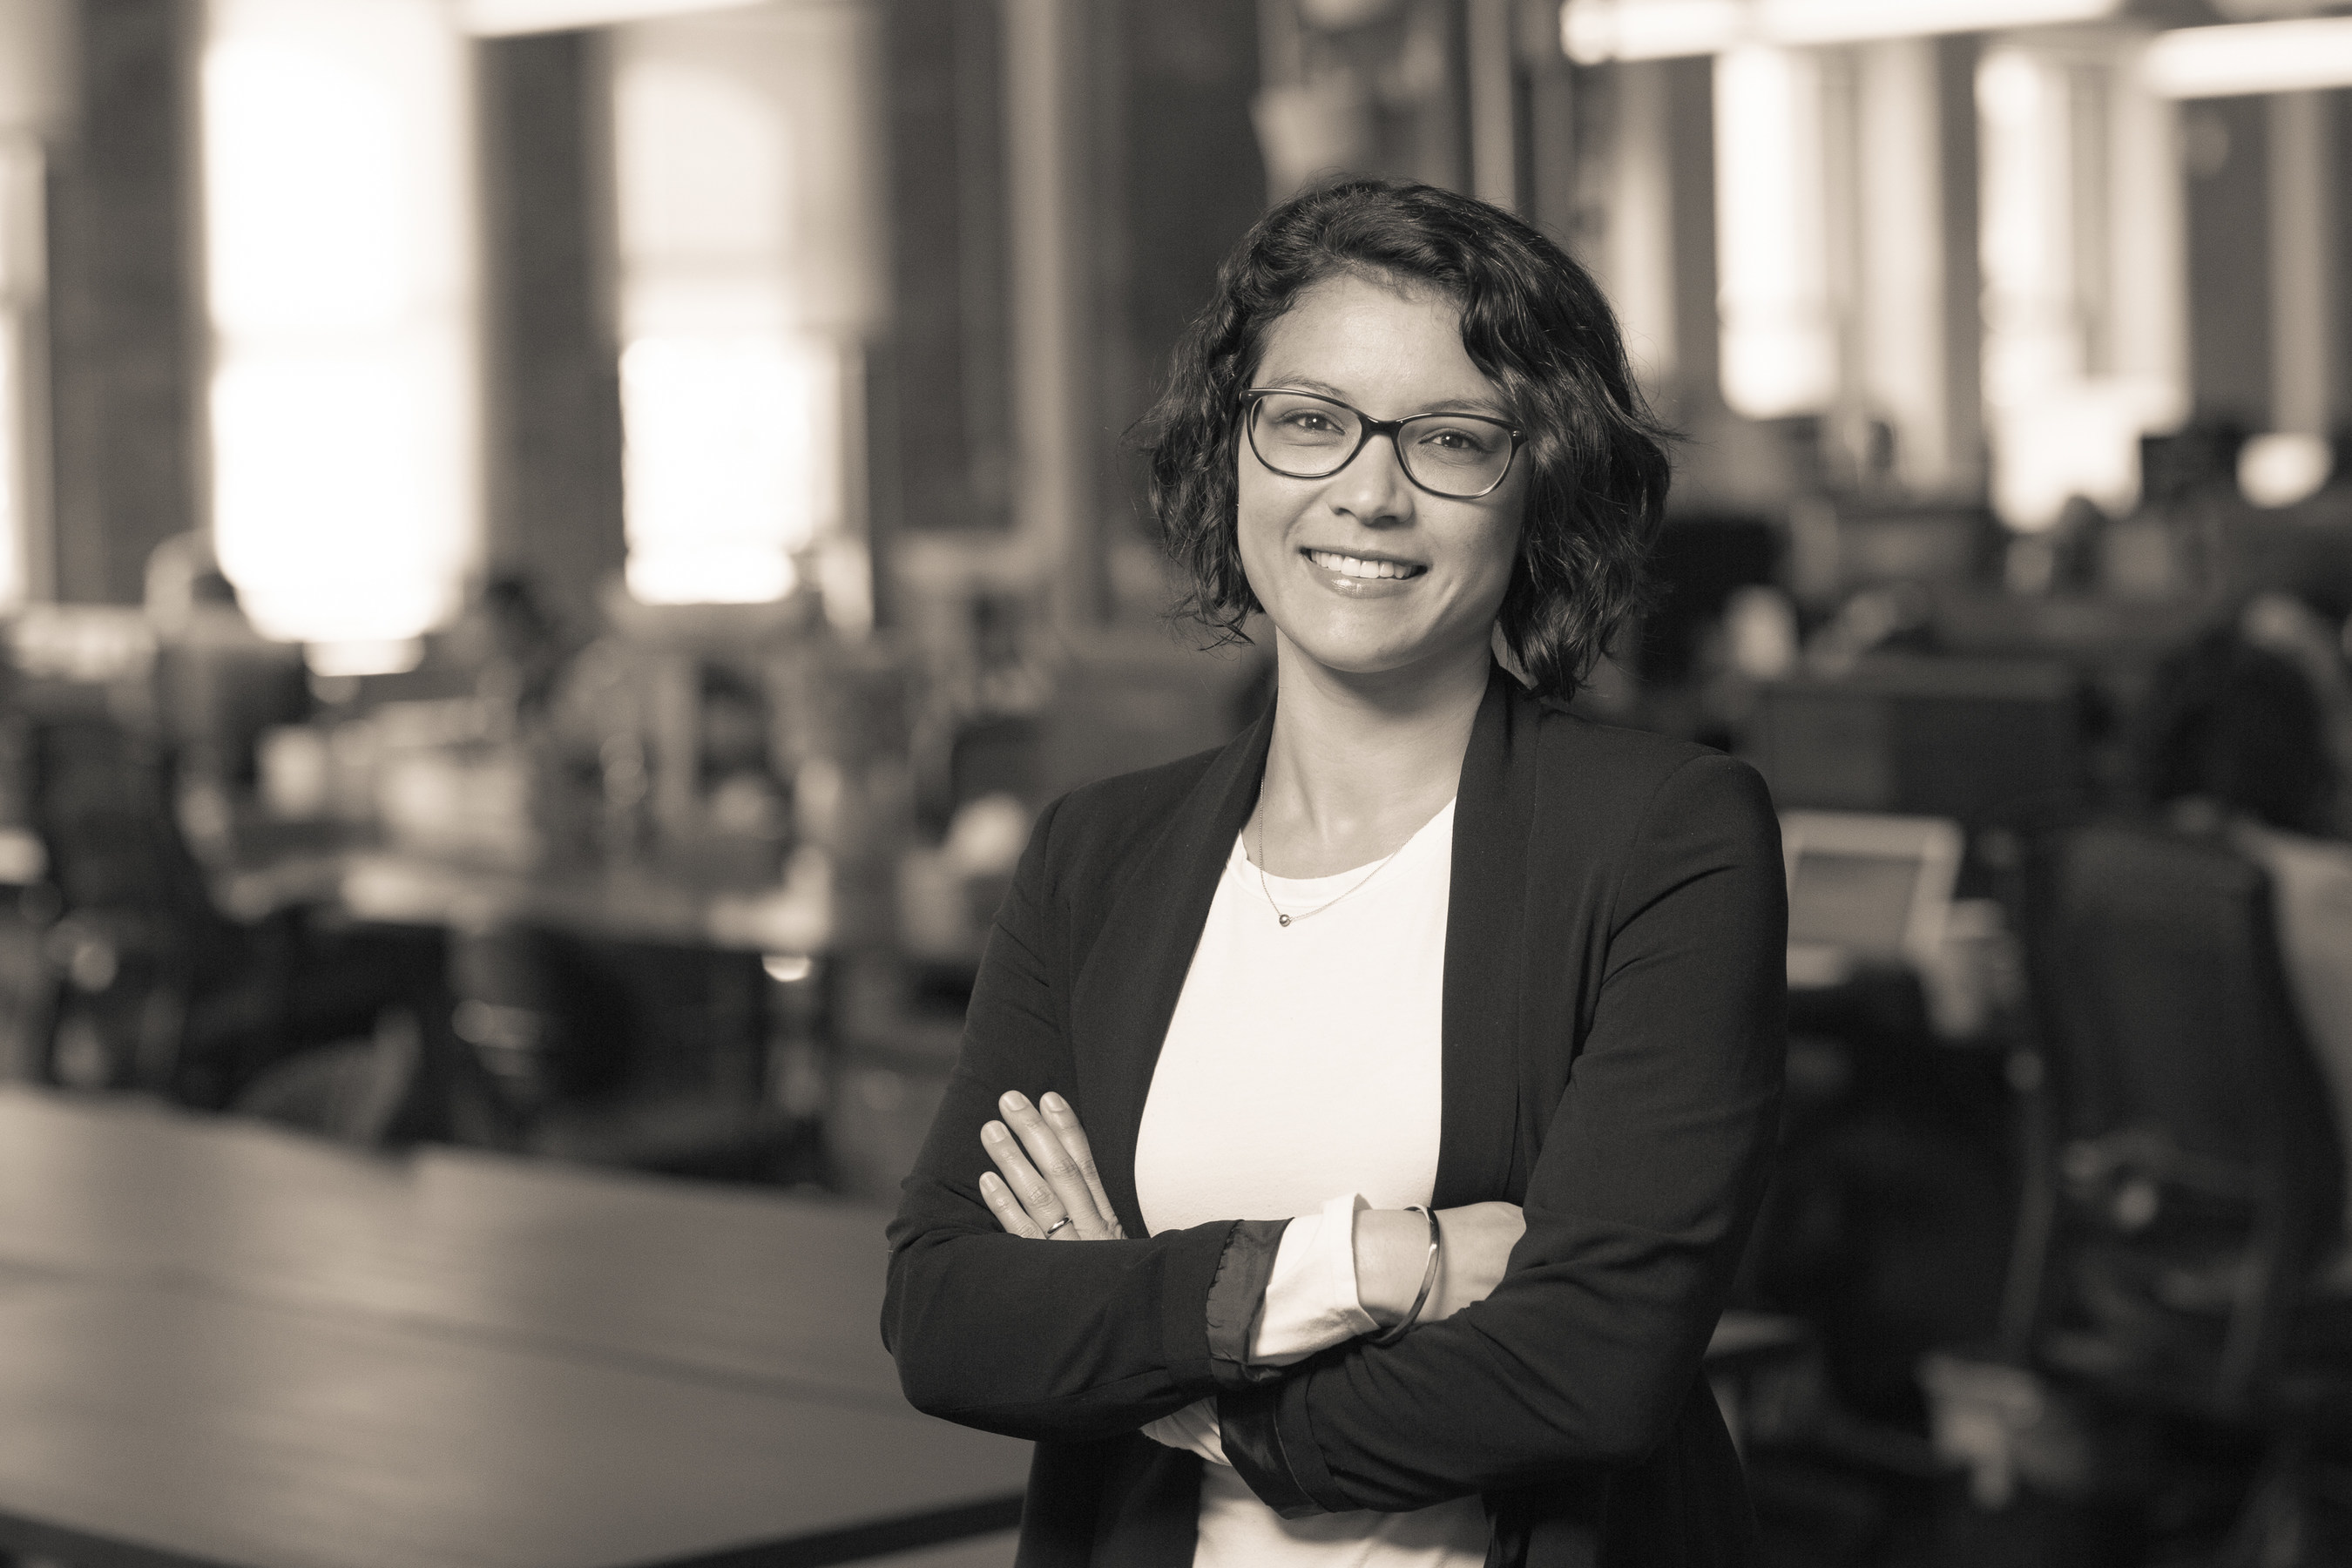 Lauren Sato, vice president of people at RealSelf